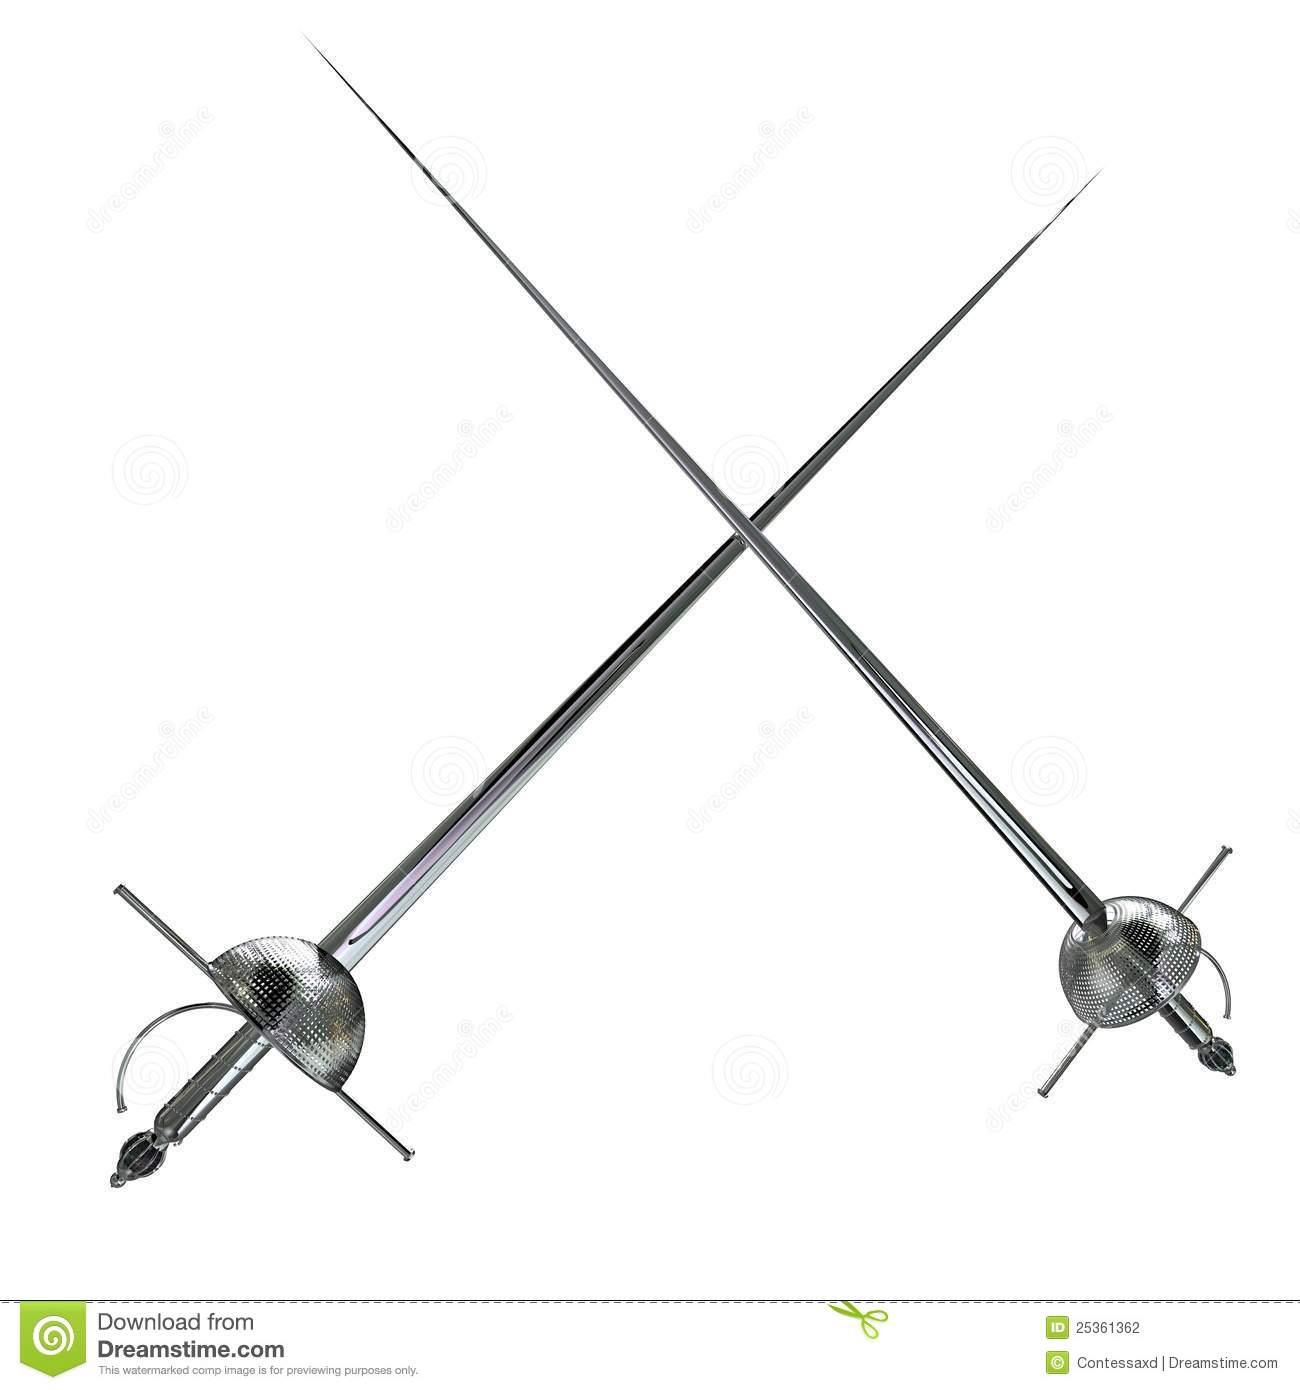 Foil Fencing Clipart